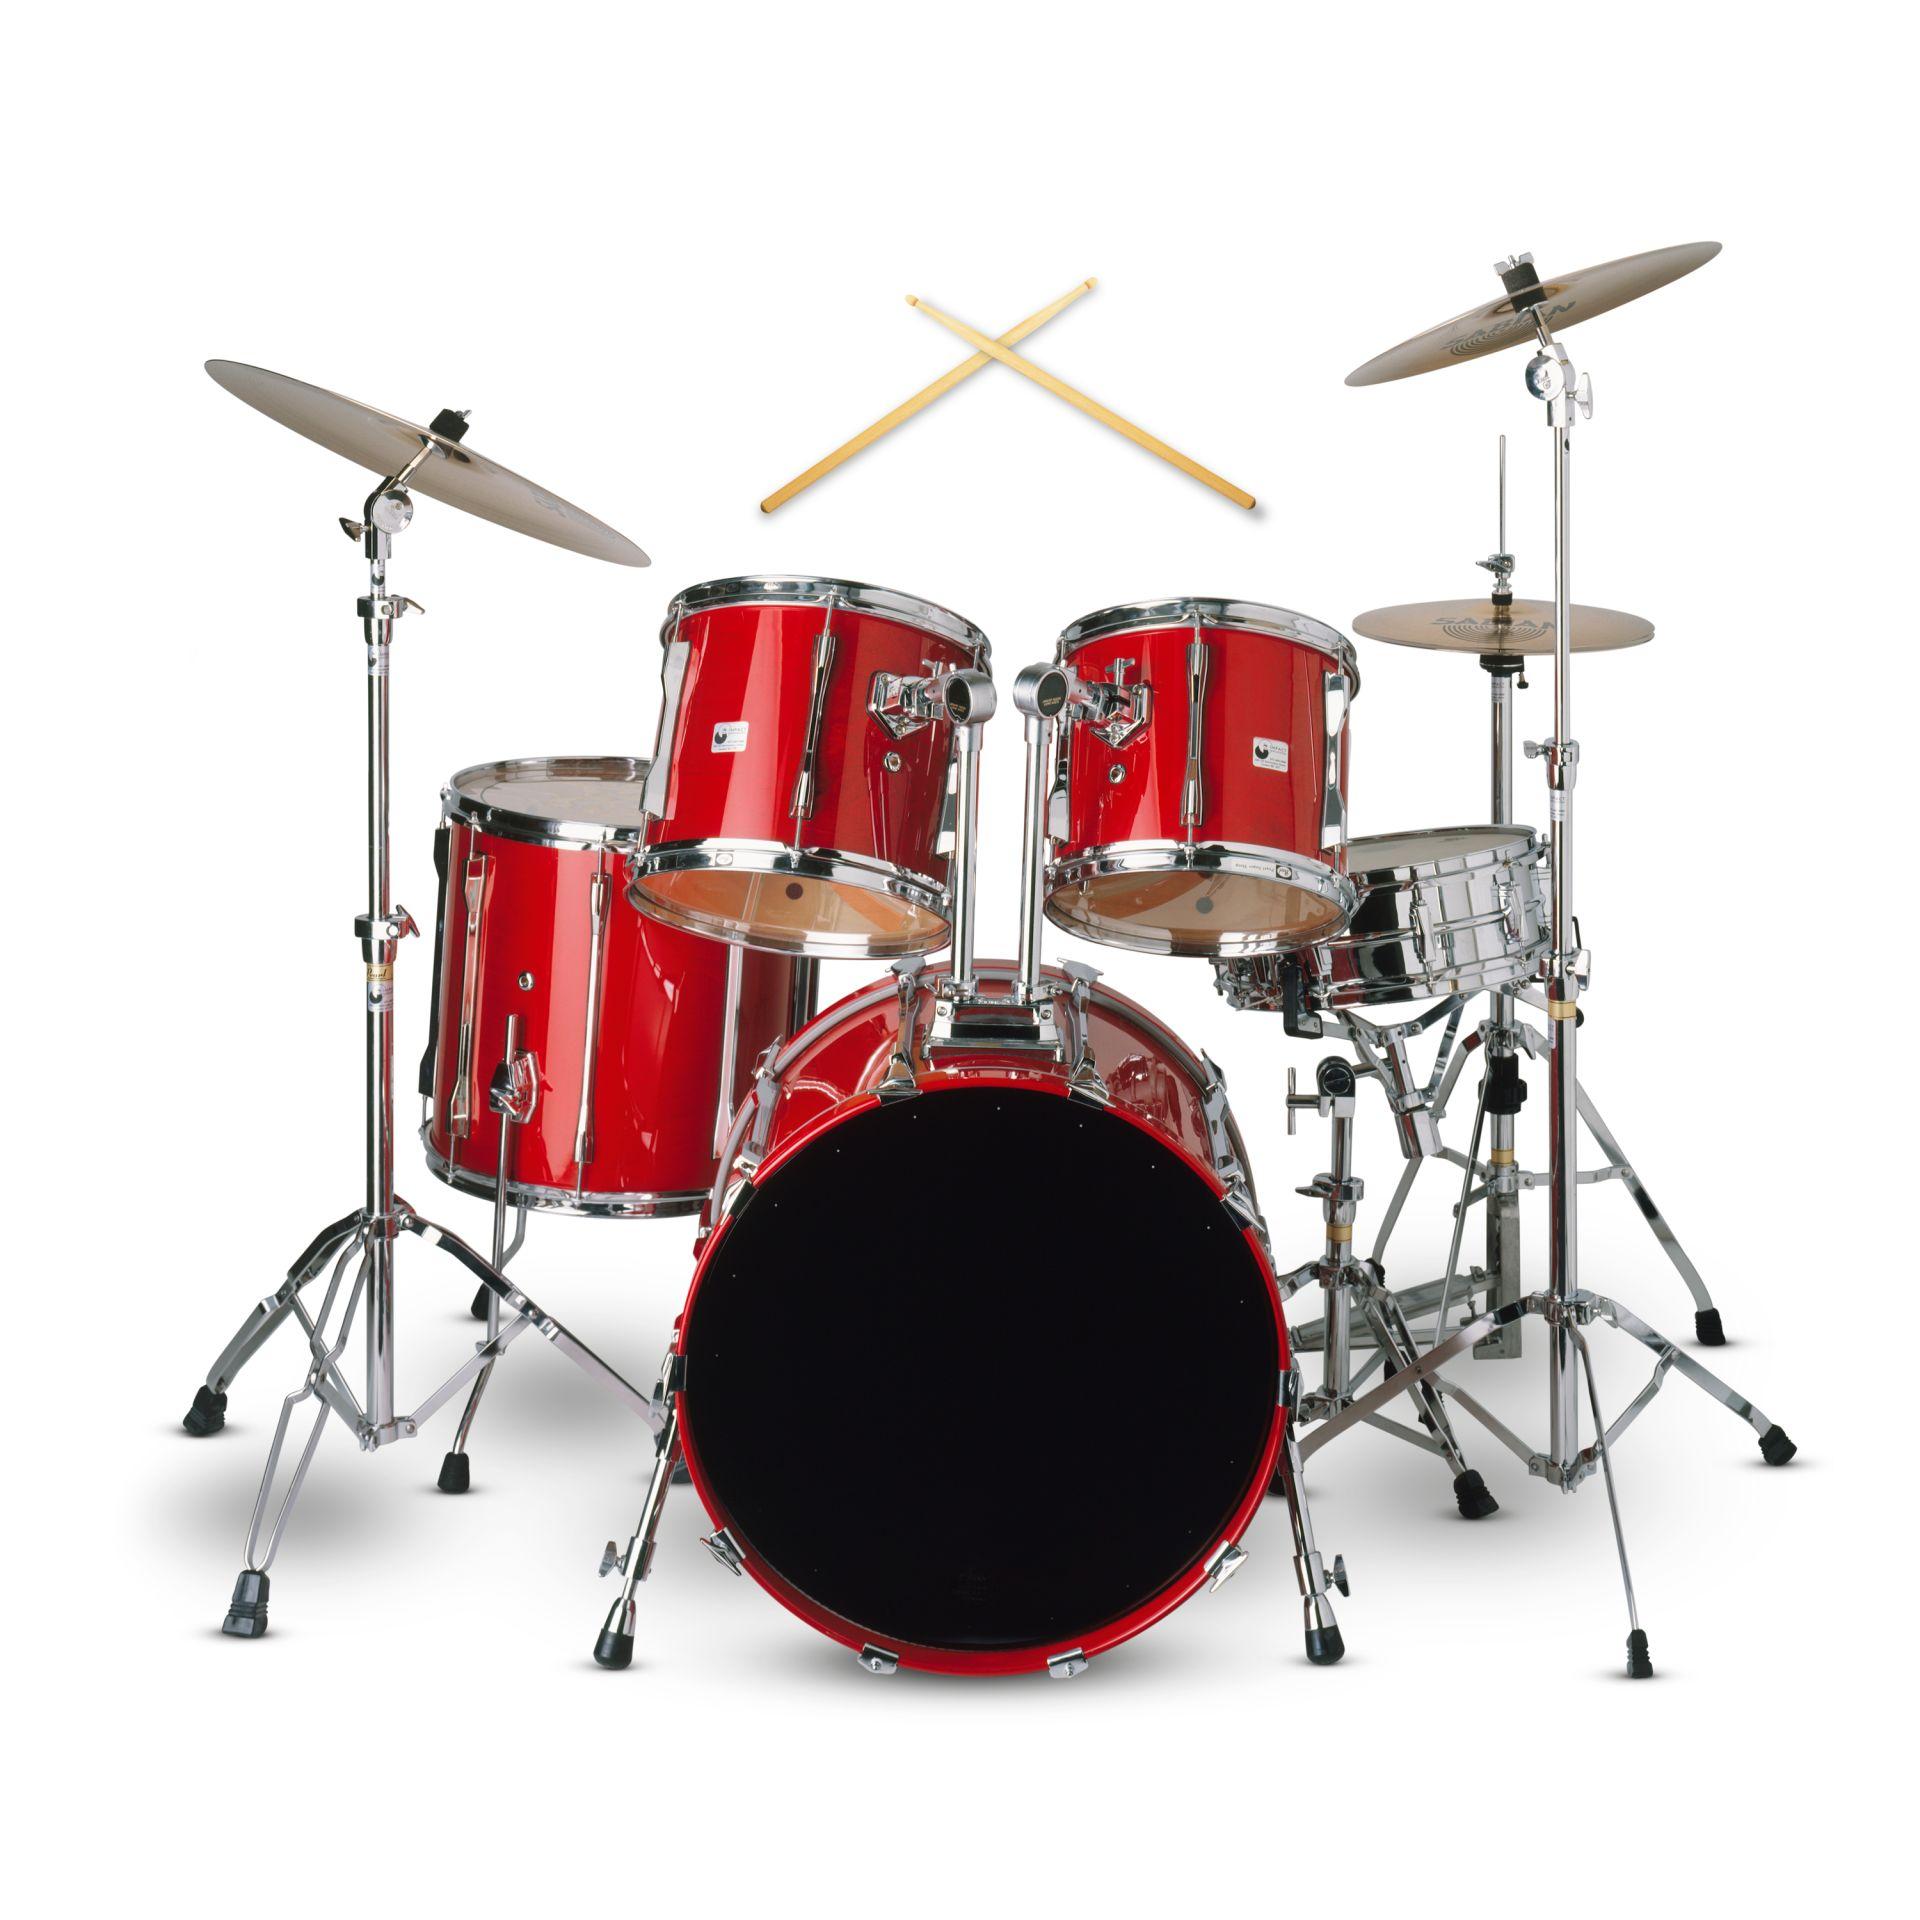 Basic Drum classes by Sounak Roy